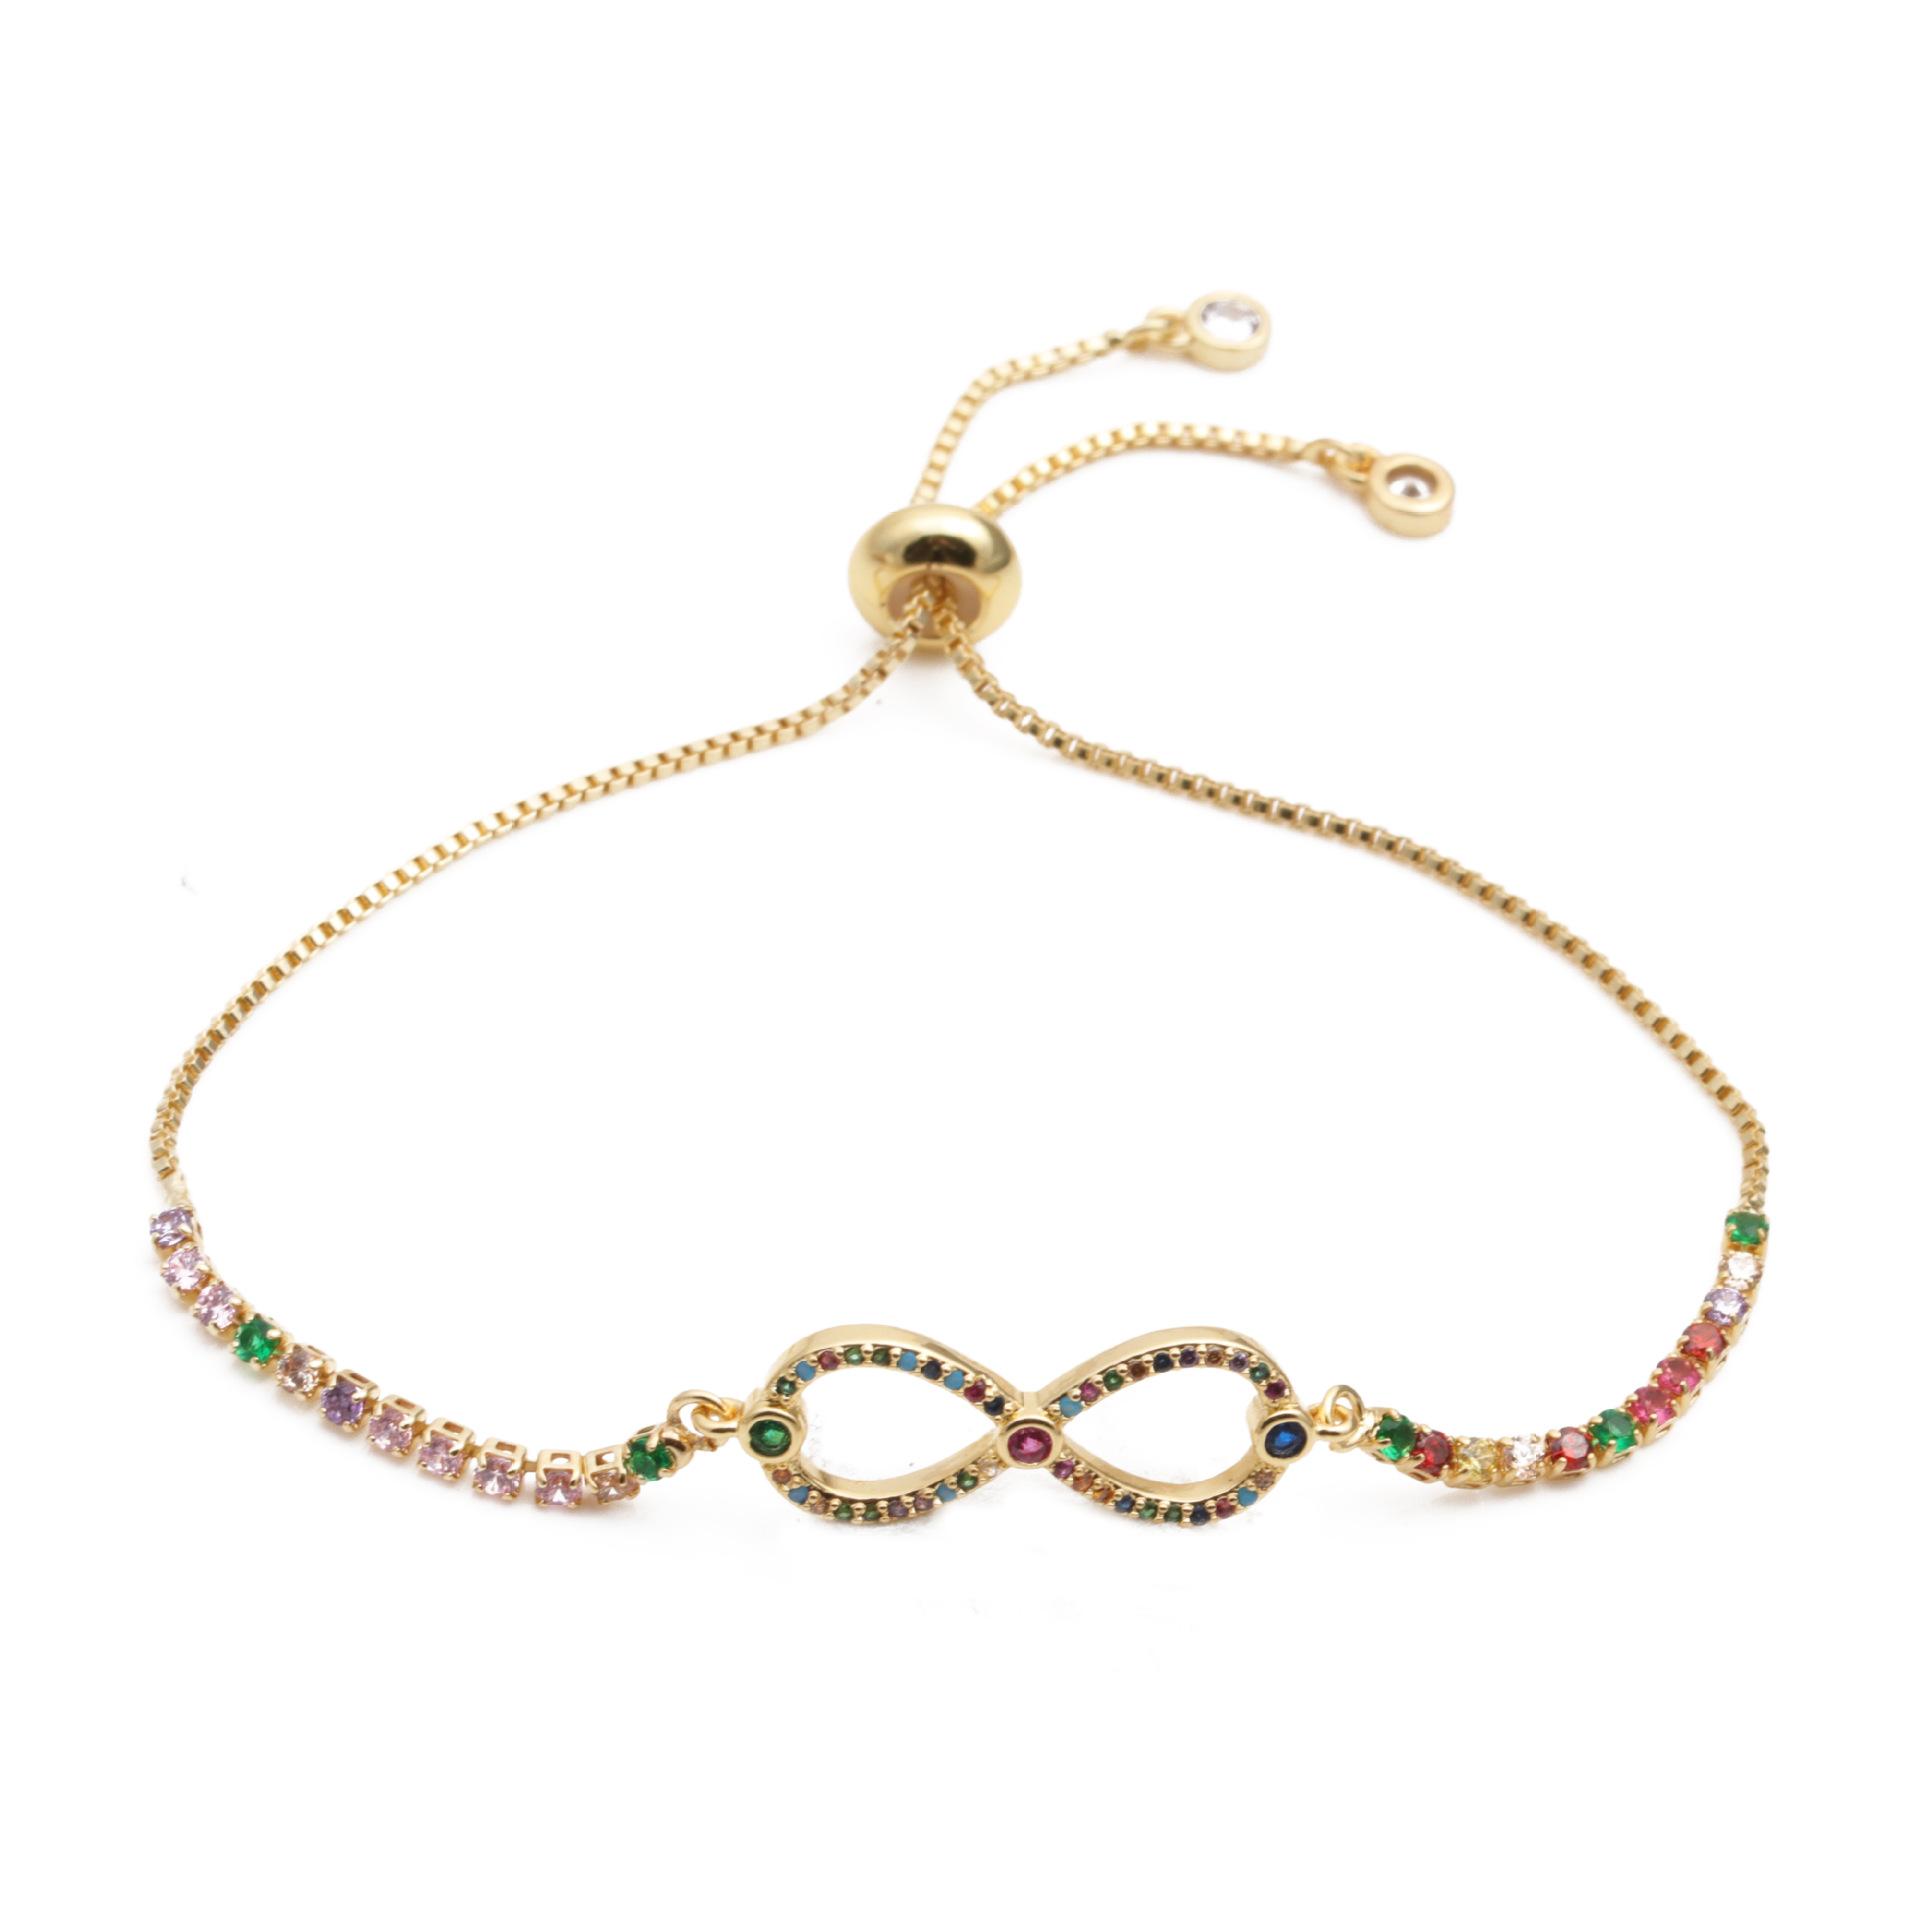 fashion jewelry copper micro inlay zirconium double 8word adjustable bracelet wholesale nihaojewelry NHYL232449